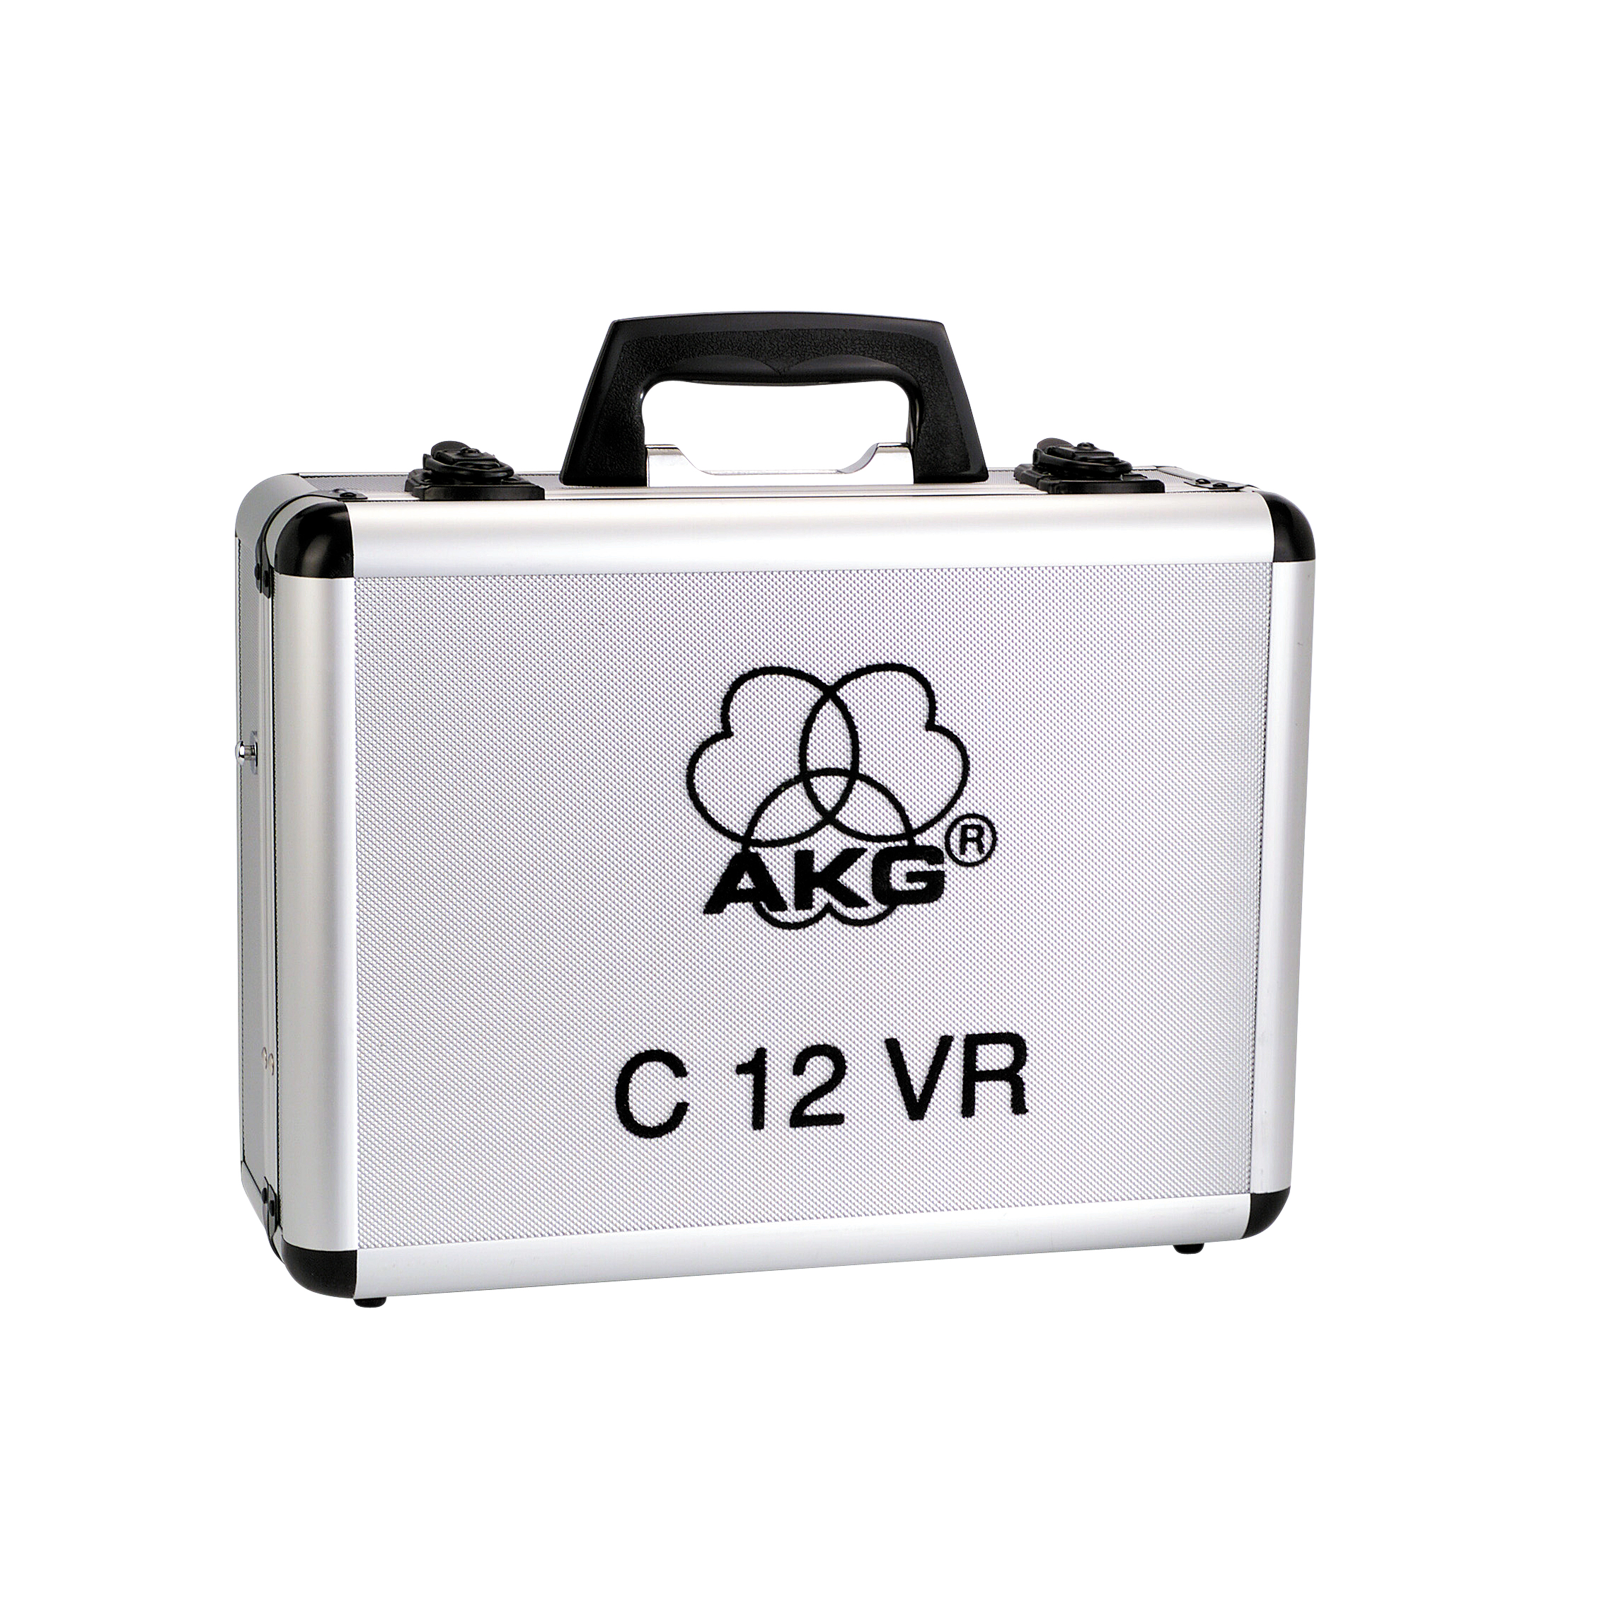 C12 VR - Green - Reference multi-pattern tube condenser microphone - Detailshot 2